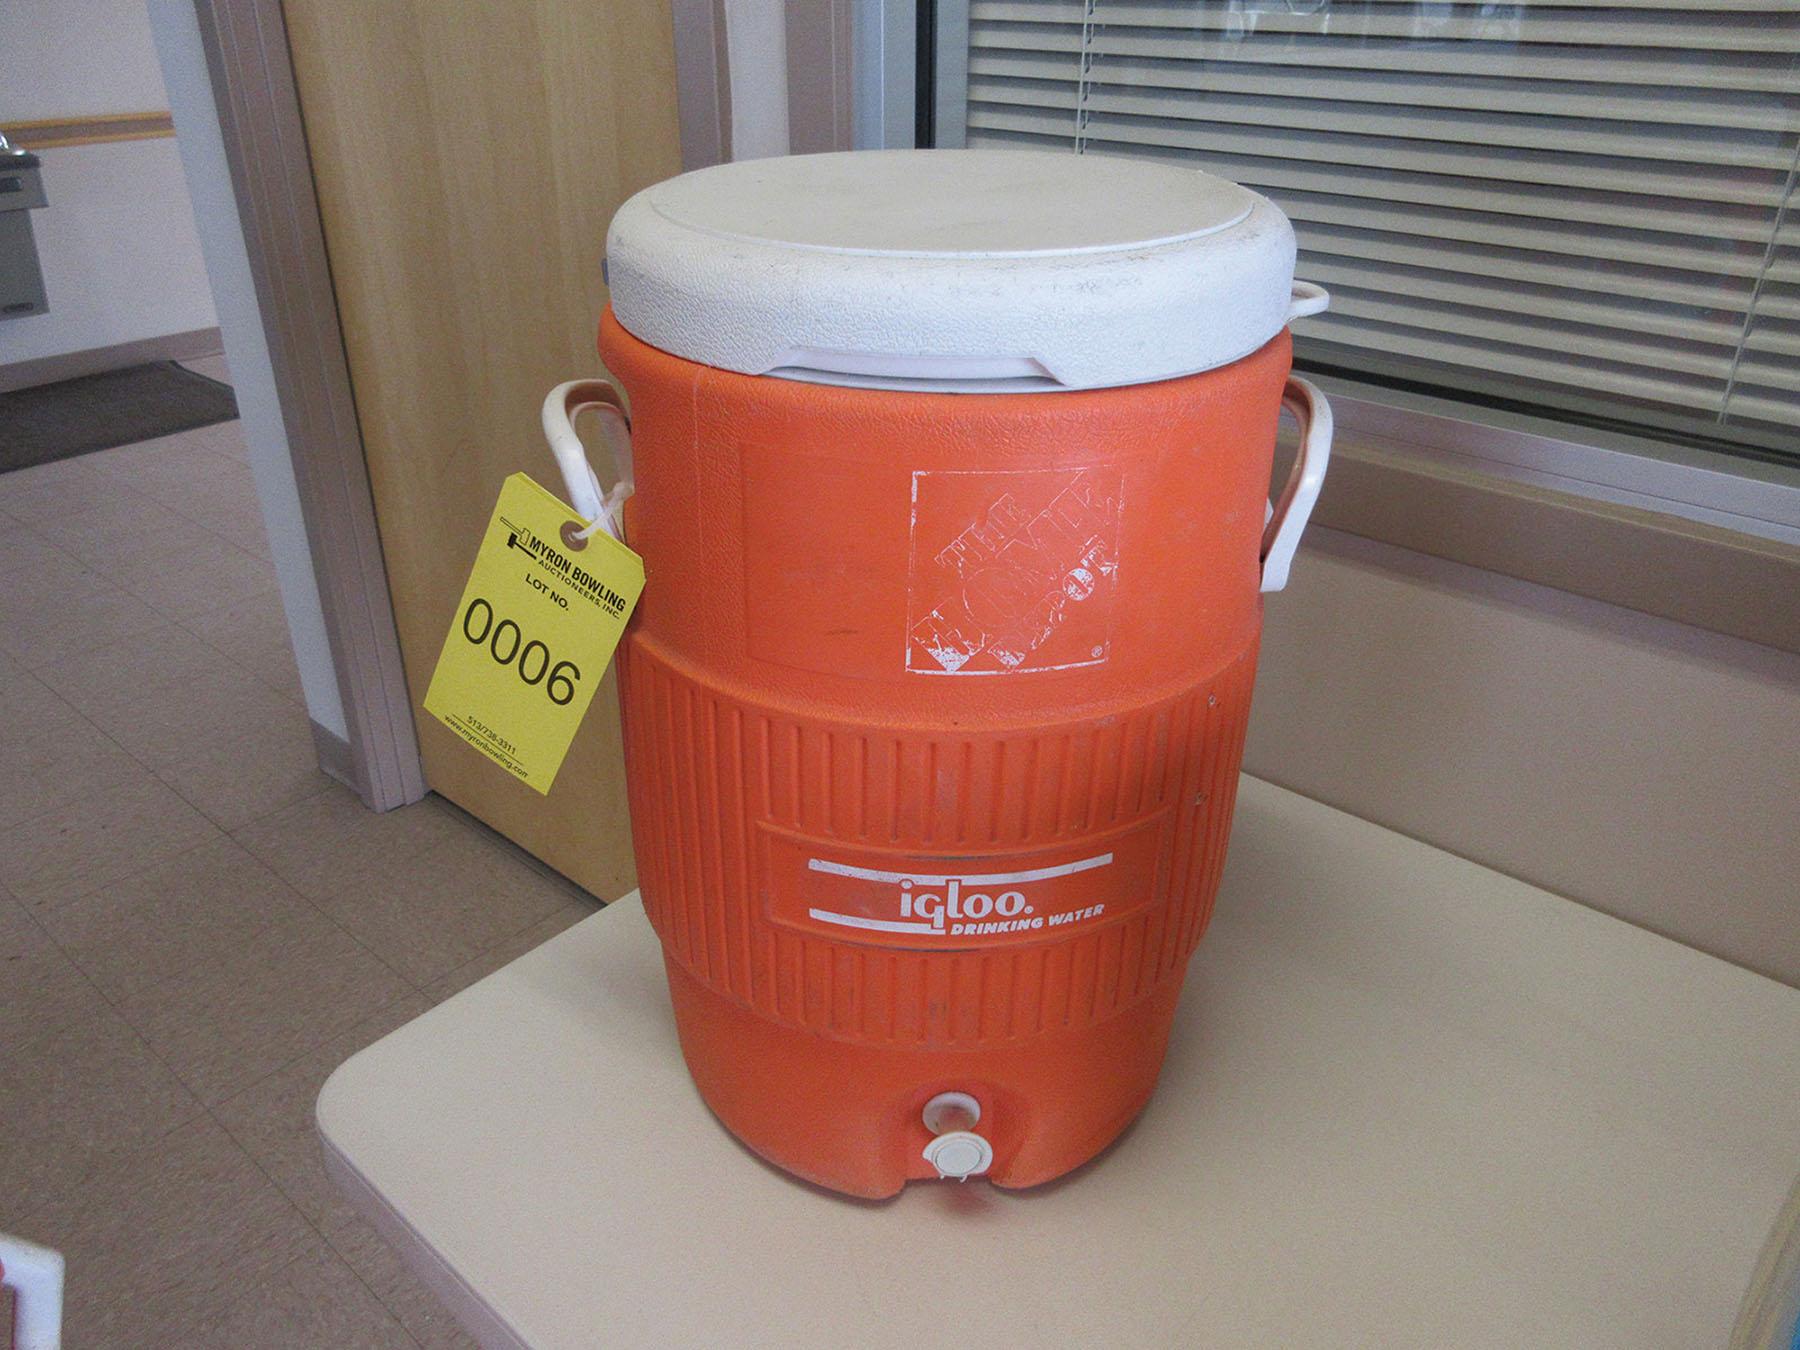 Lot 6 - IGLOO 5-GALLON WATER COOLER